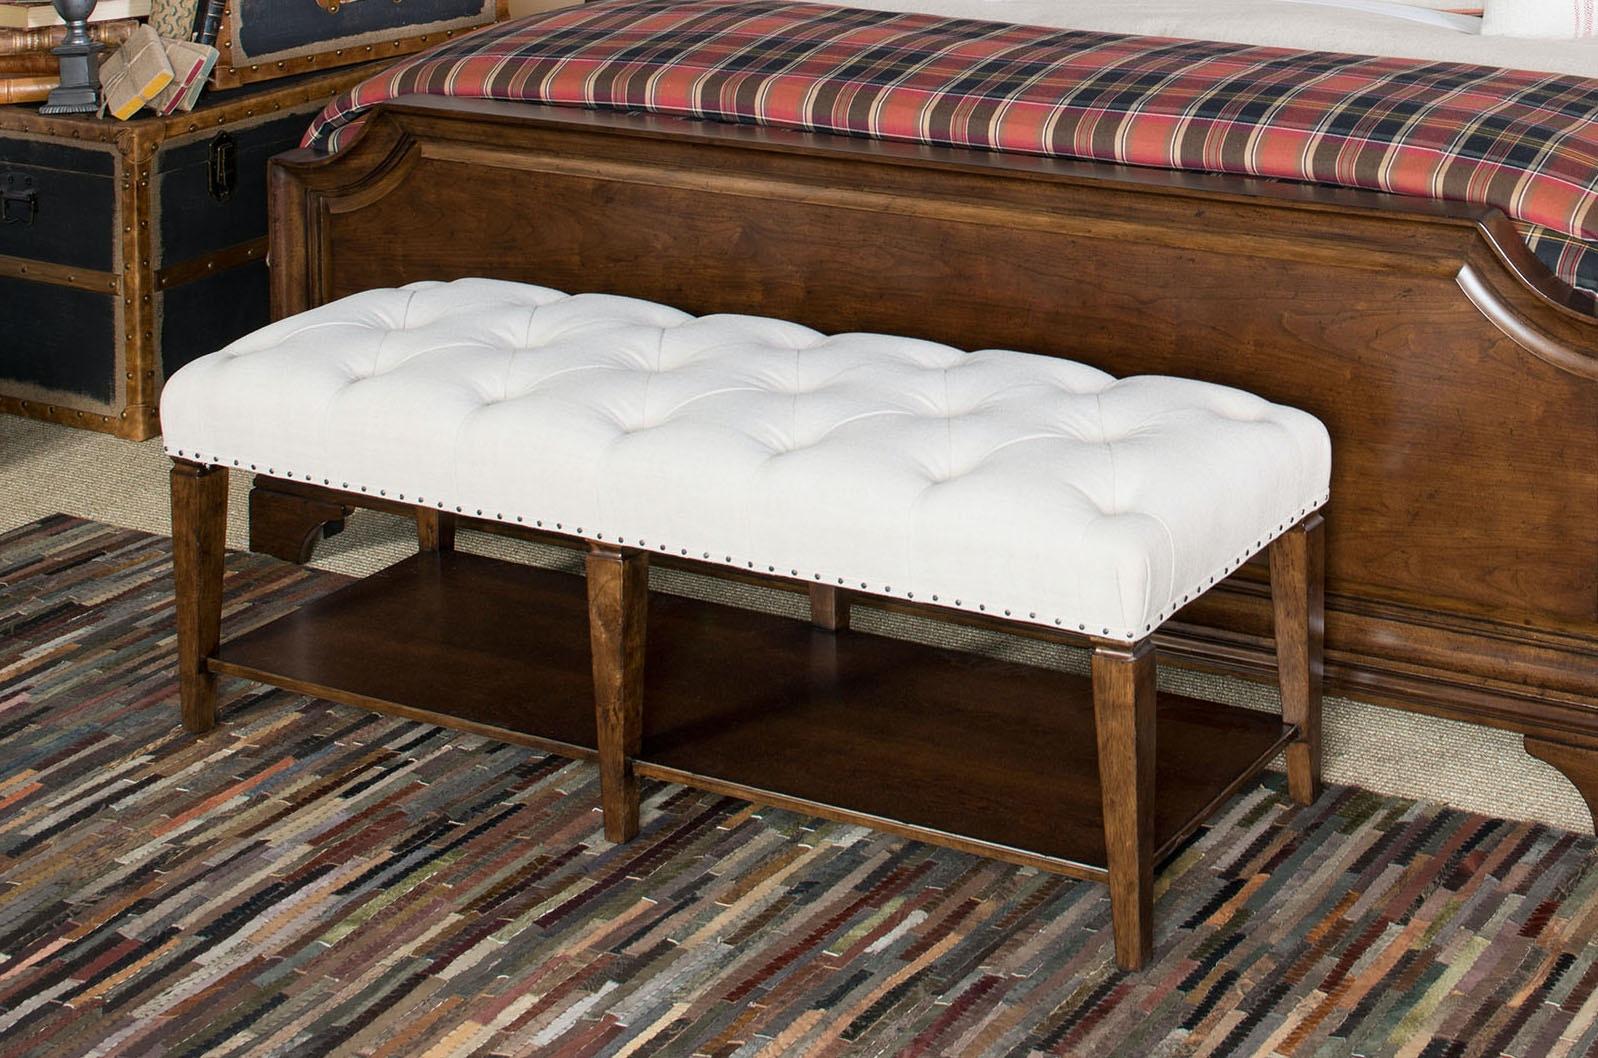 Bedroom Benches Furniture Fair Cincinnati & Dayton OH